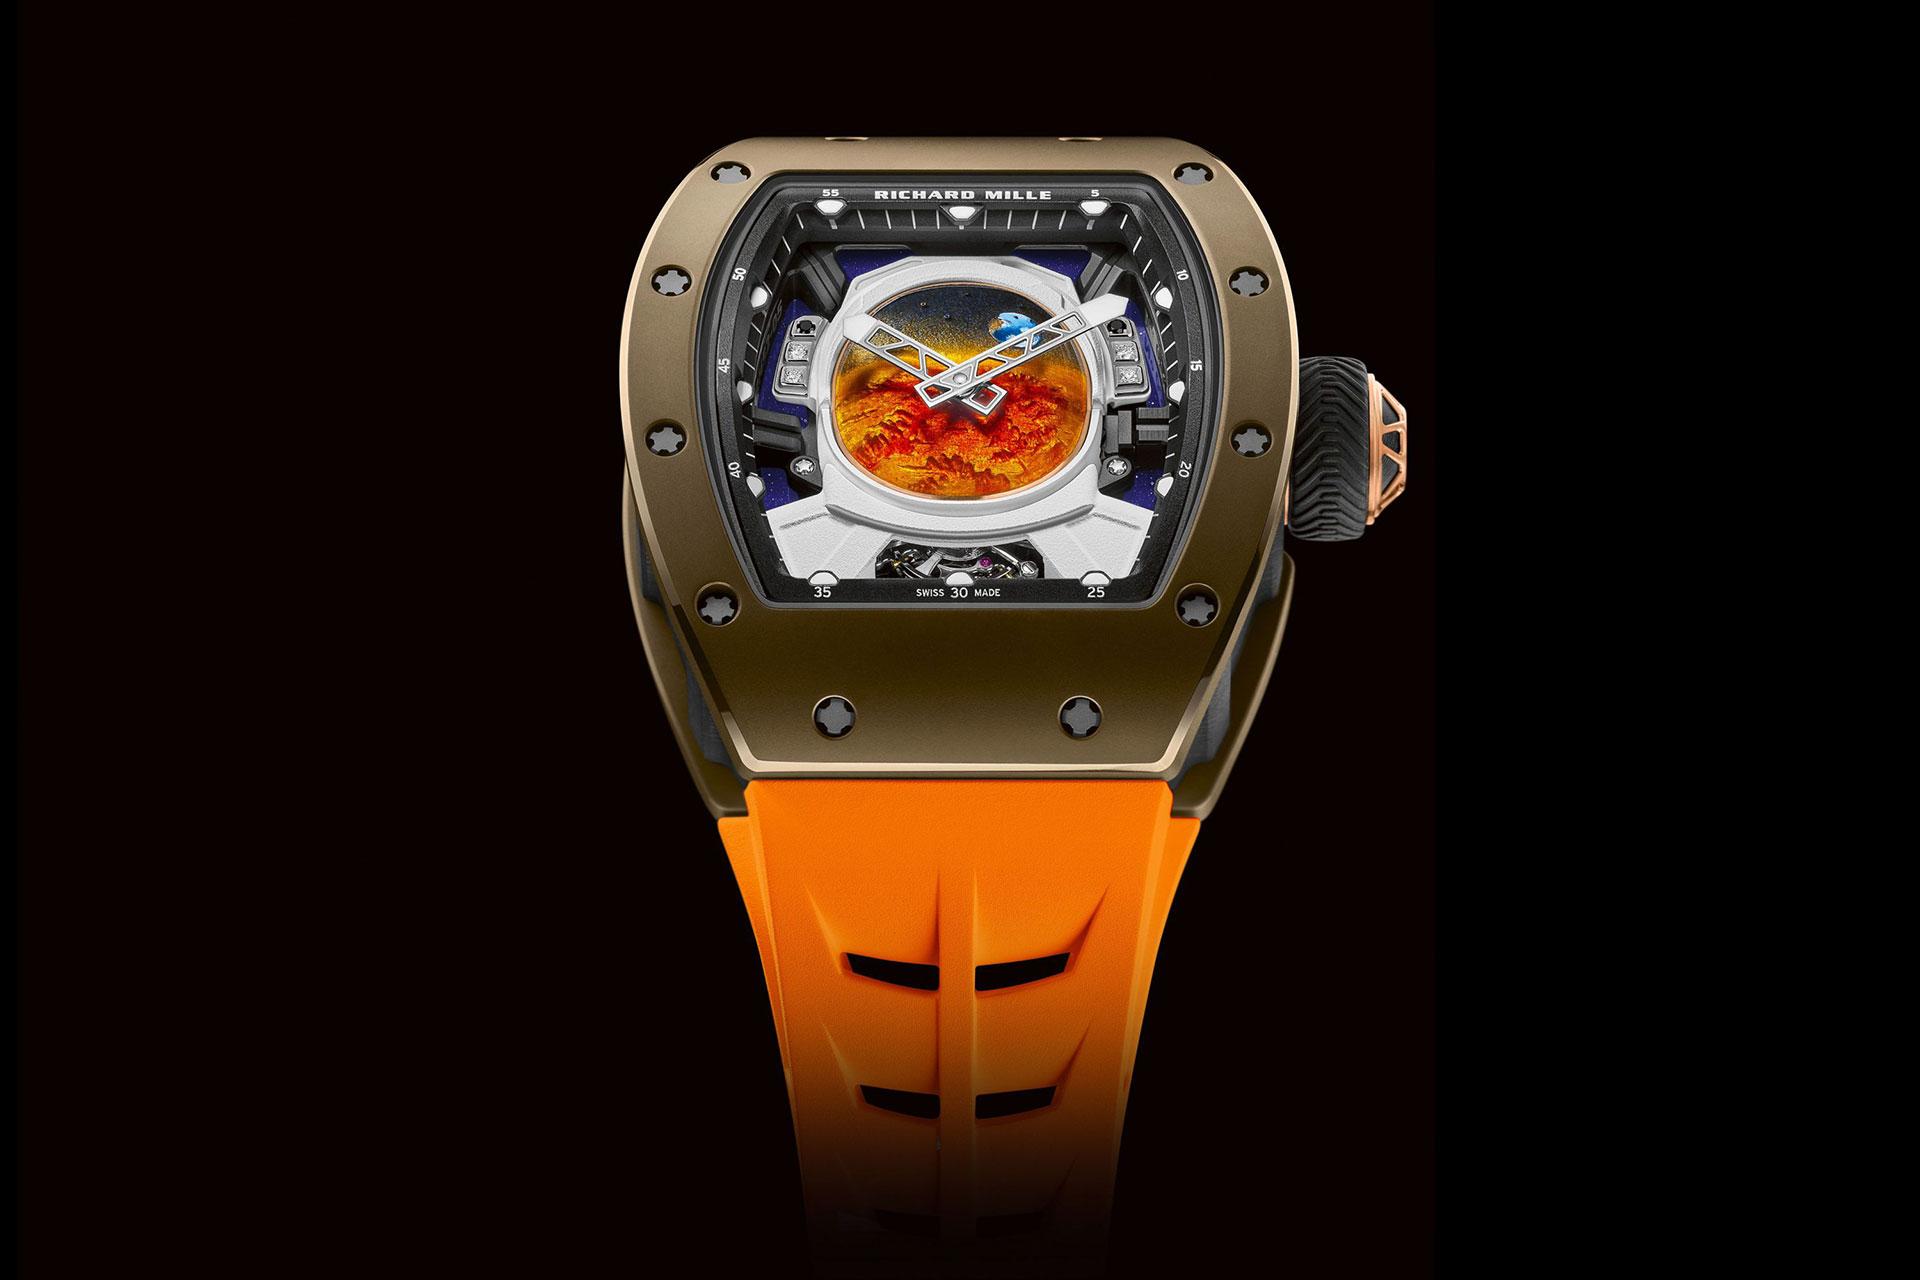 Richard Mille x Pharrell RM 52-05 Tourbillon Watch